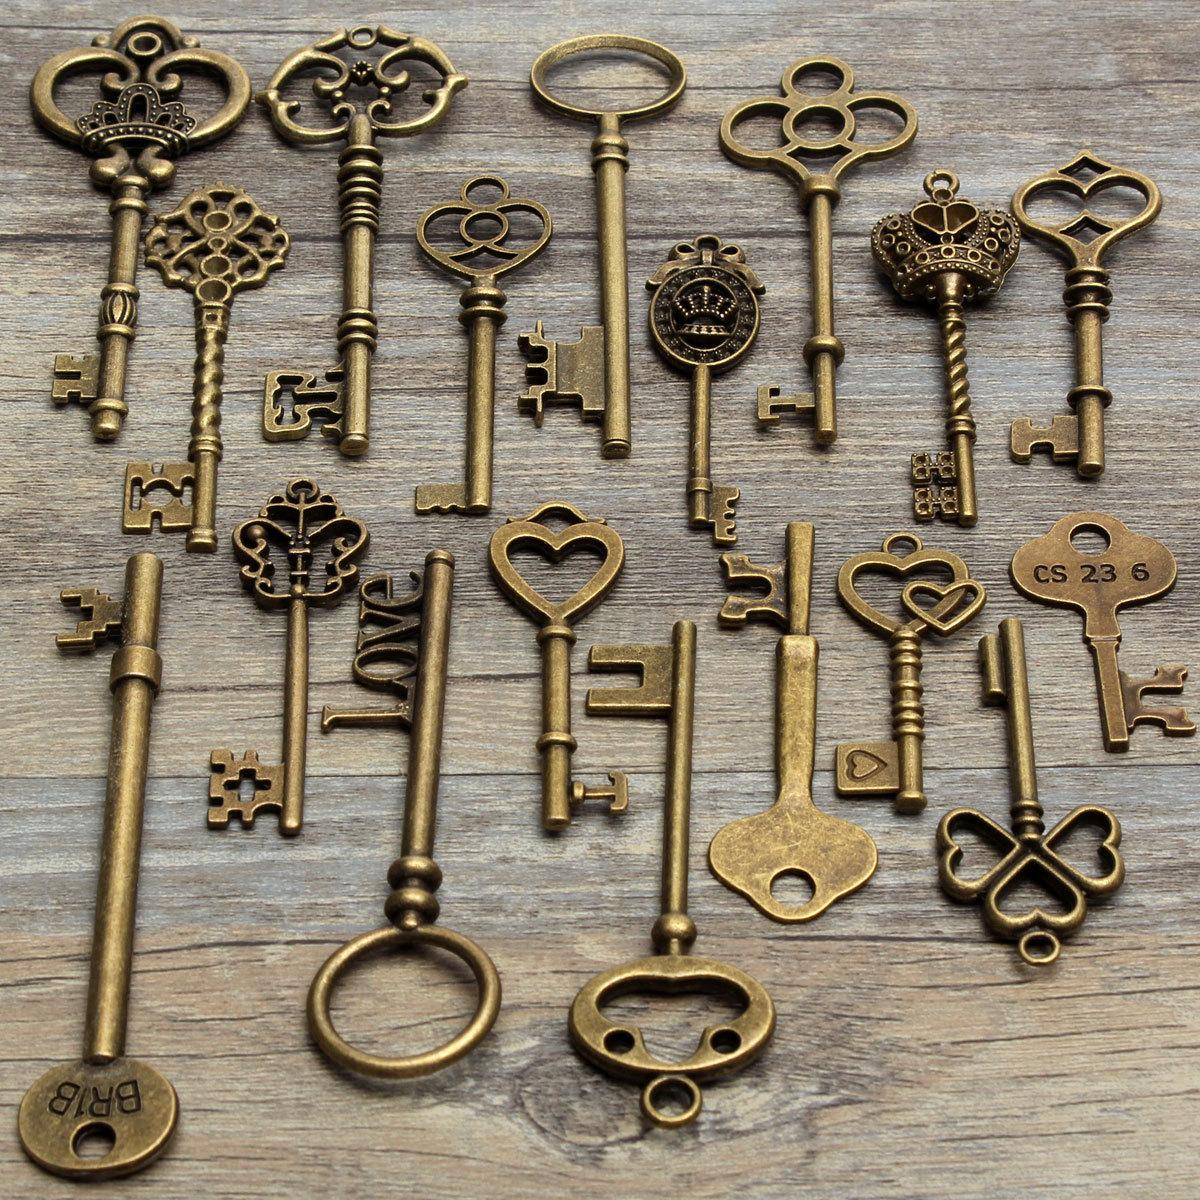 70Pcs Vintage Antique Old Look Bronze Skeleton Key Fancy Heart Bow Pendant